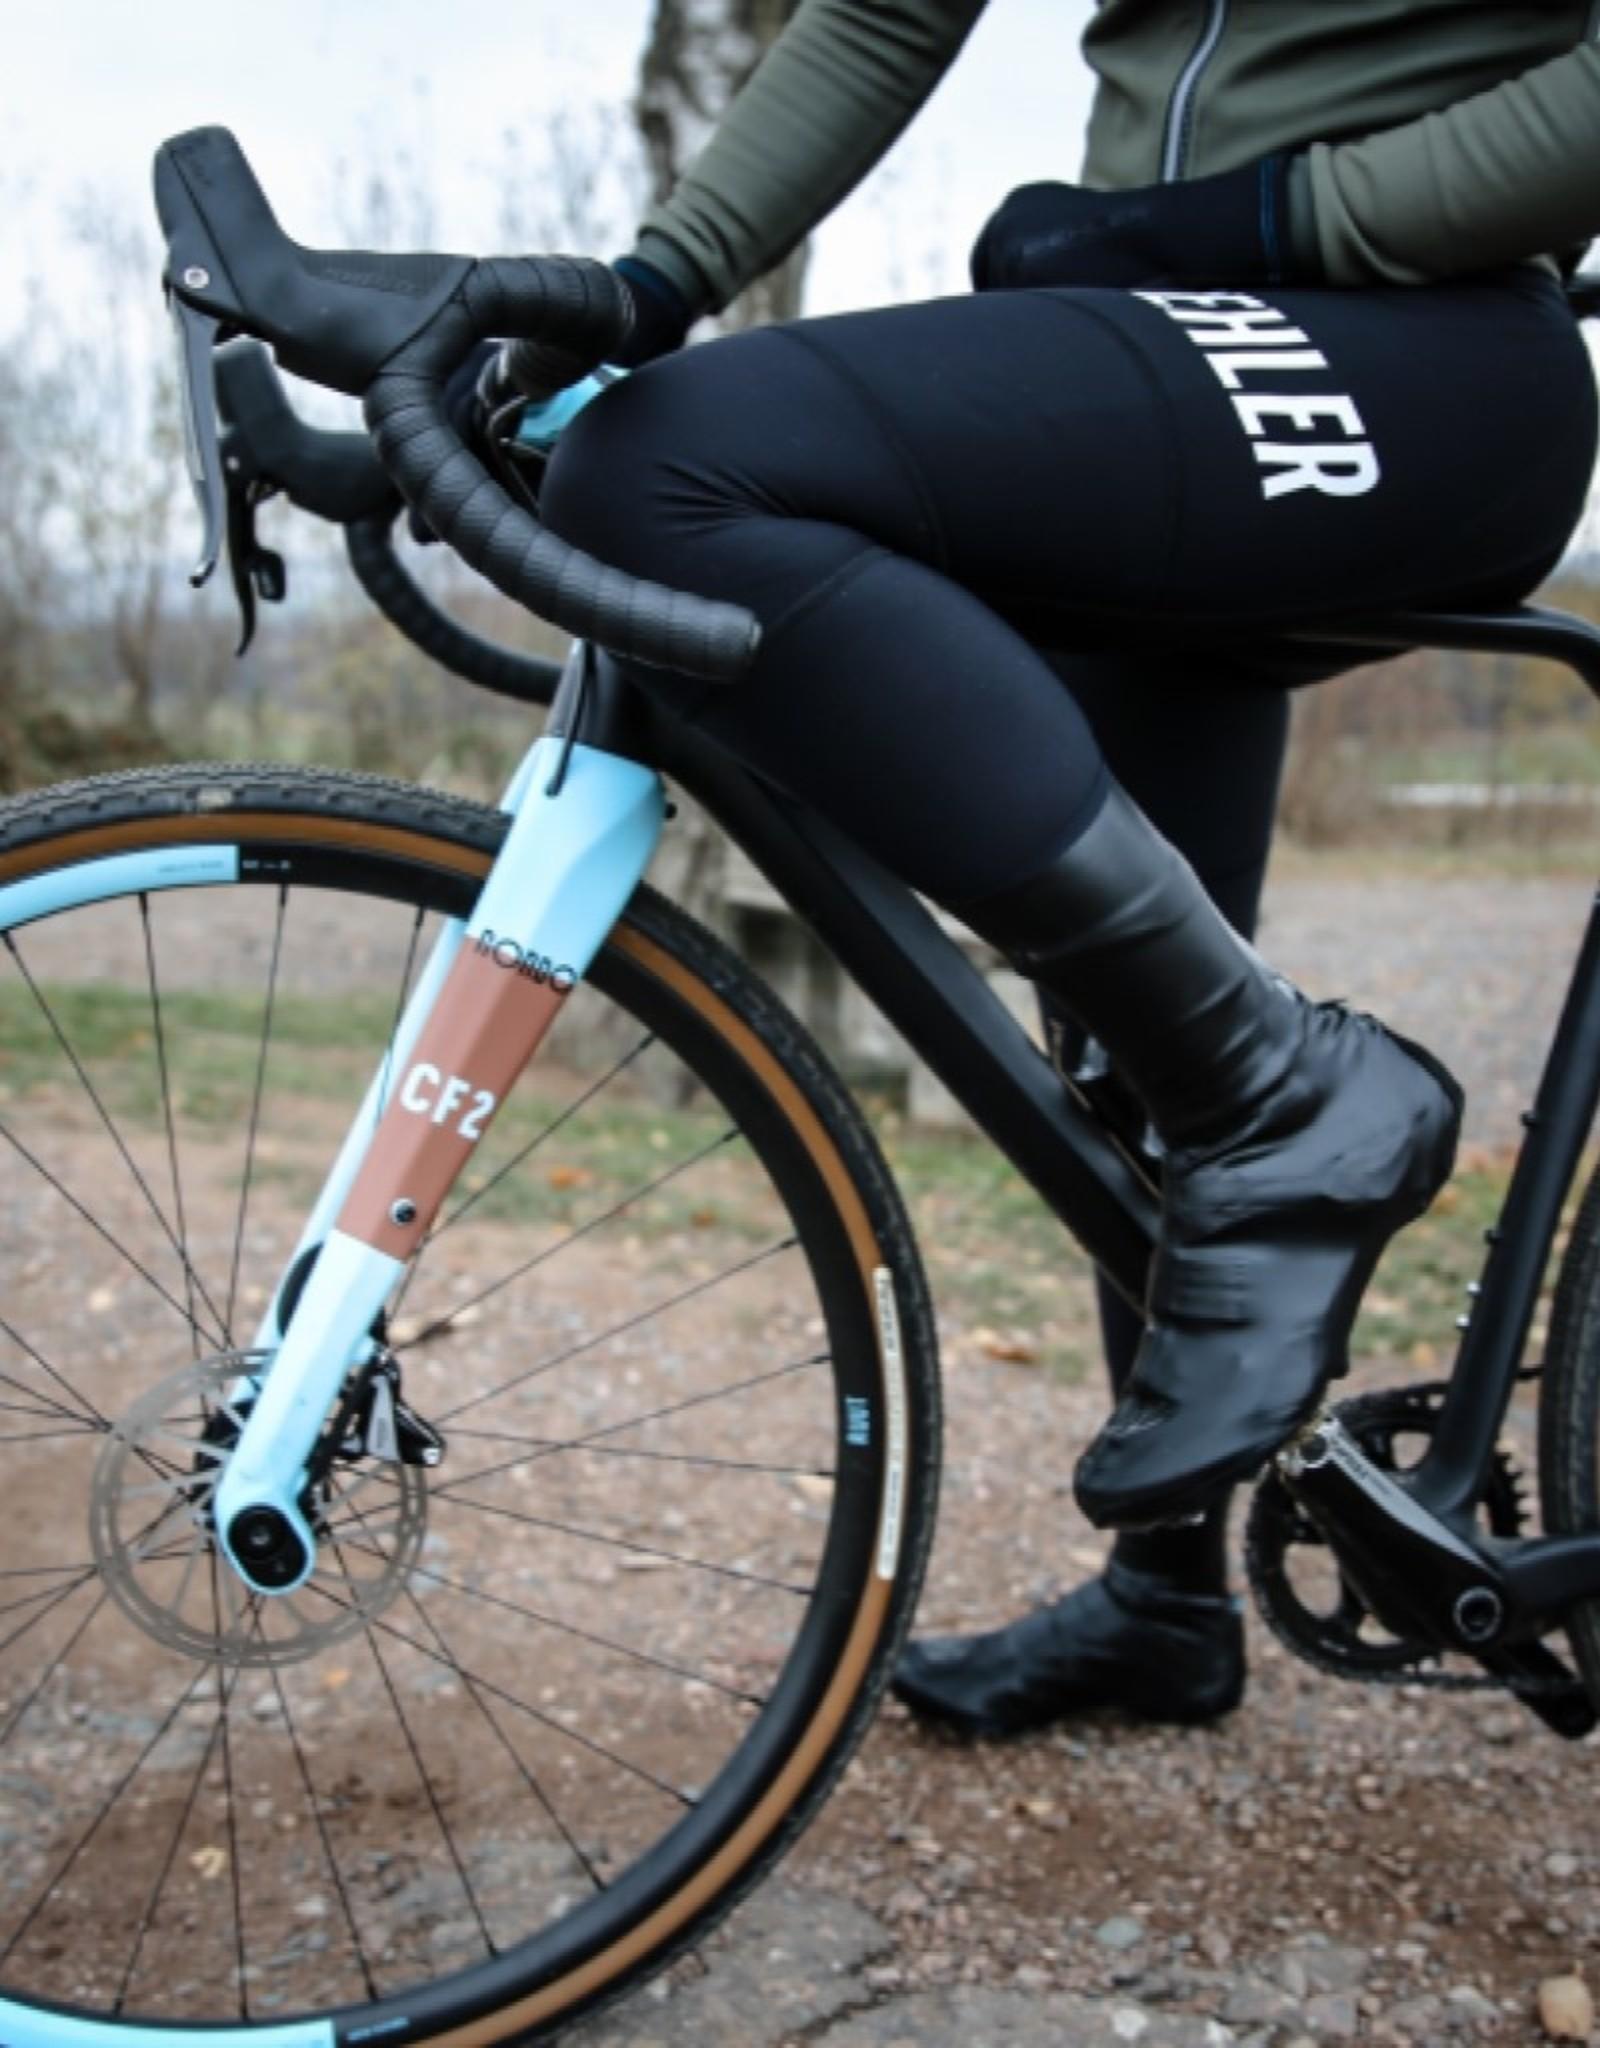 Biehler Rain Protect Overshoes